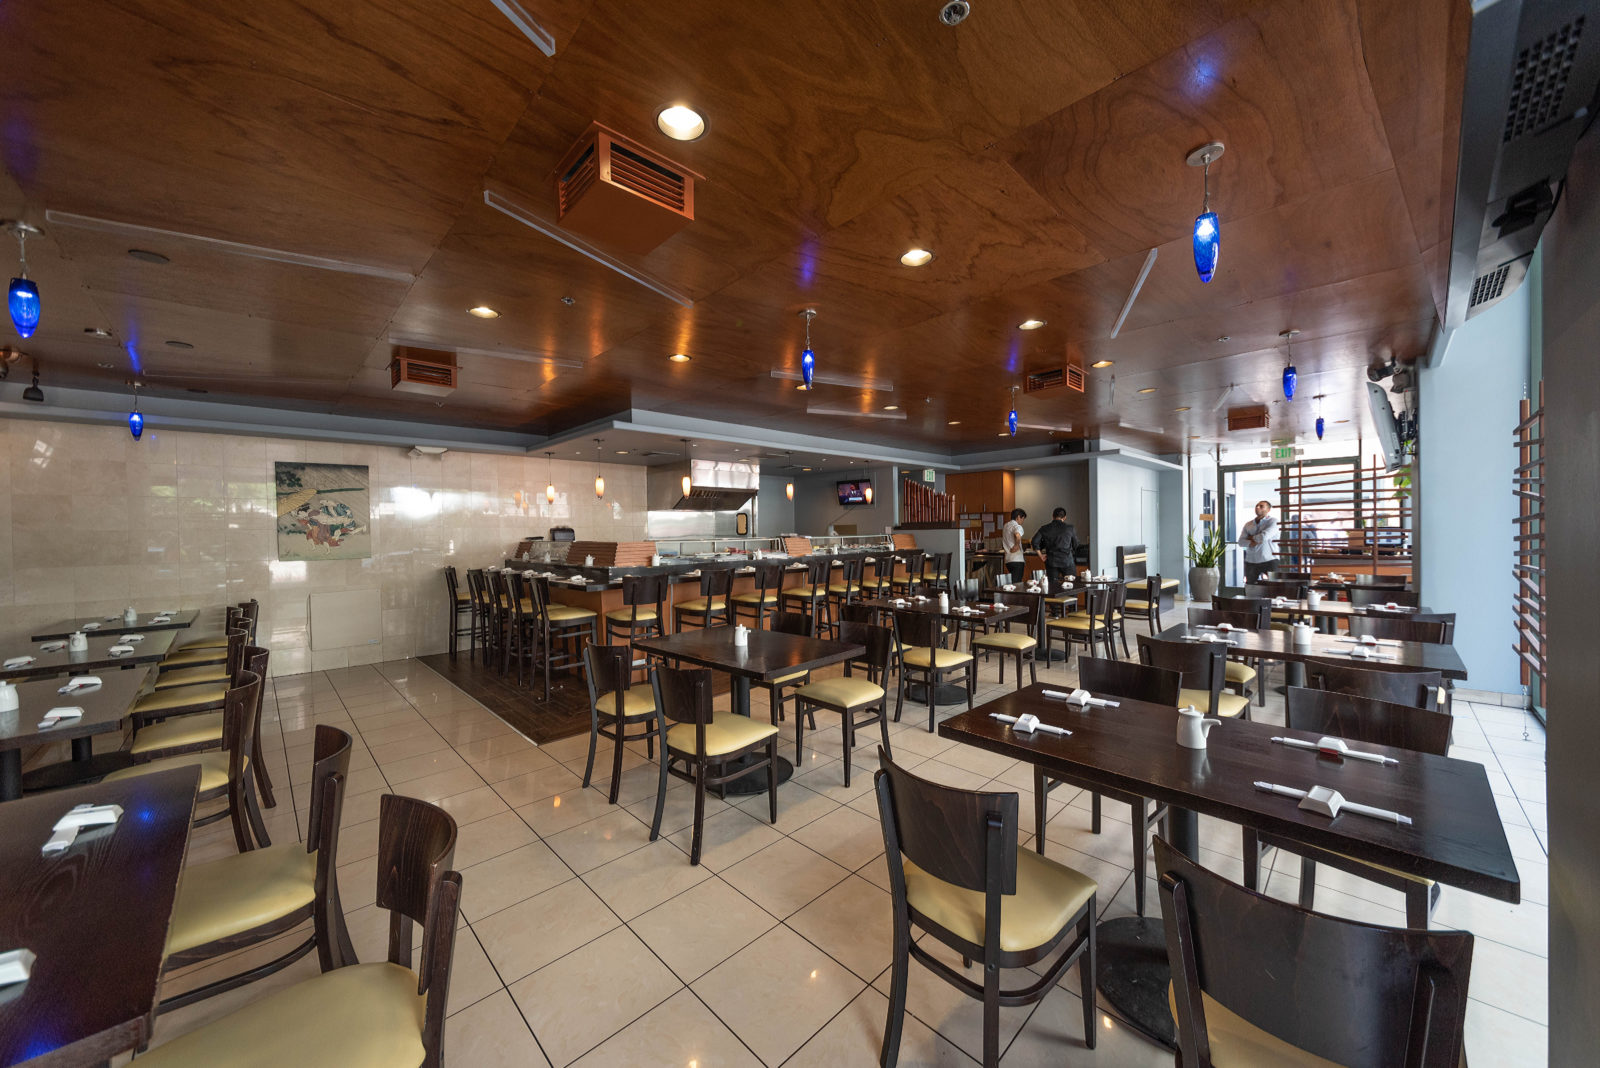 Dtla Sushi Restaurant Wynn Locations Film Locations Los Angeles